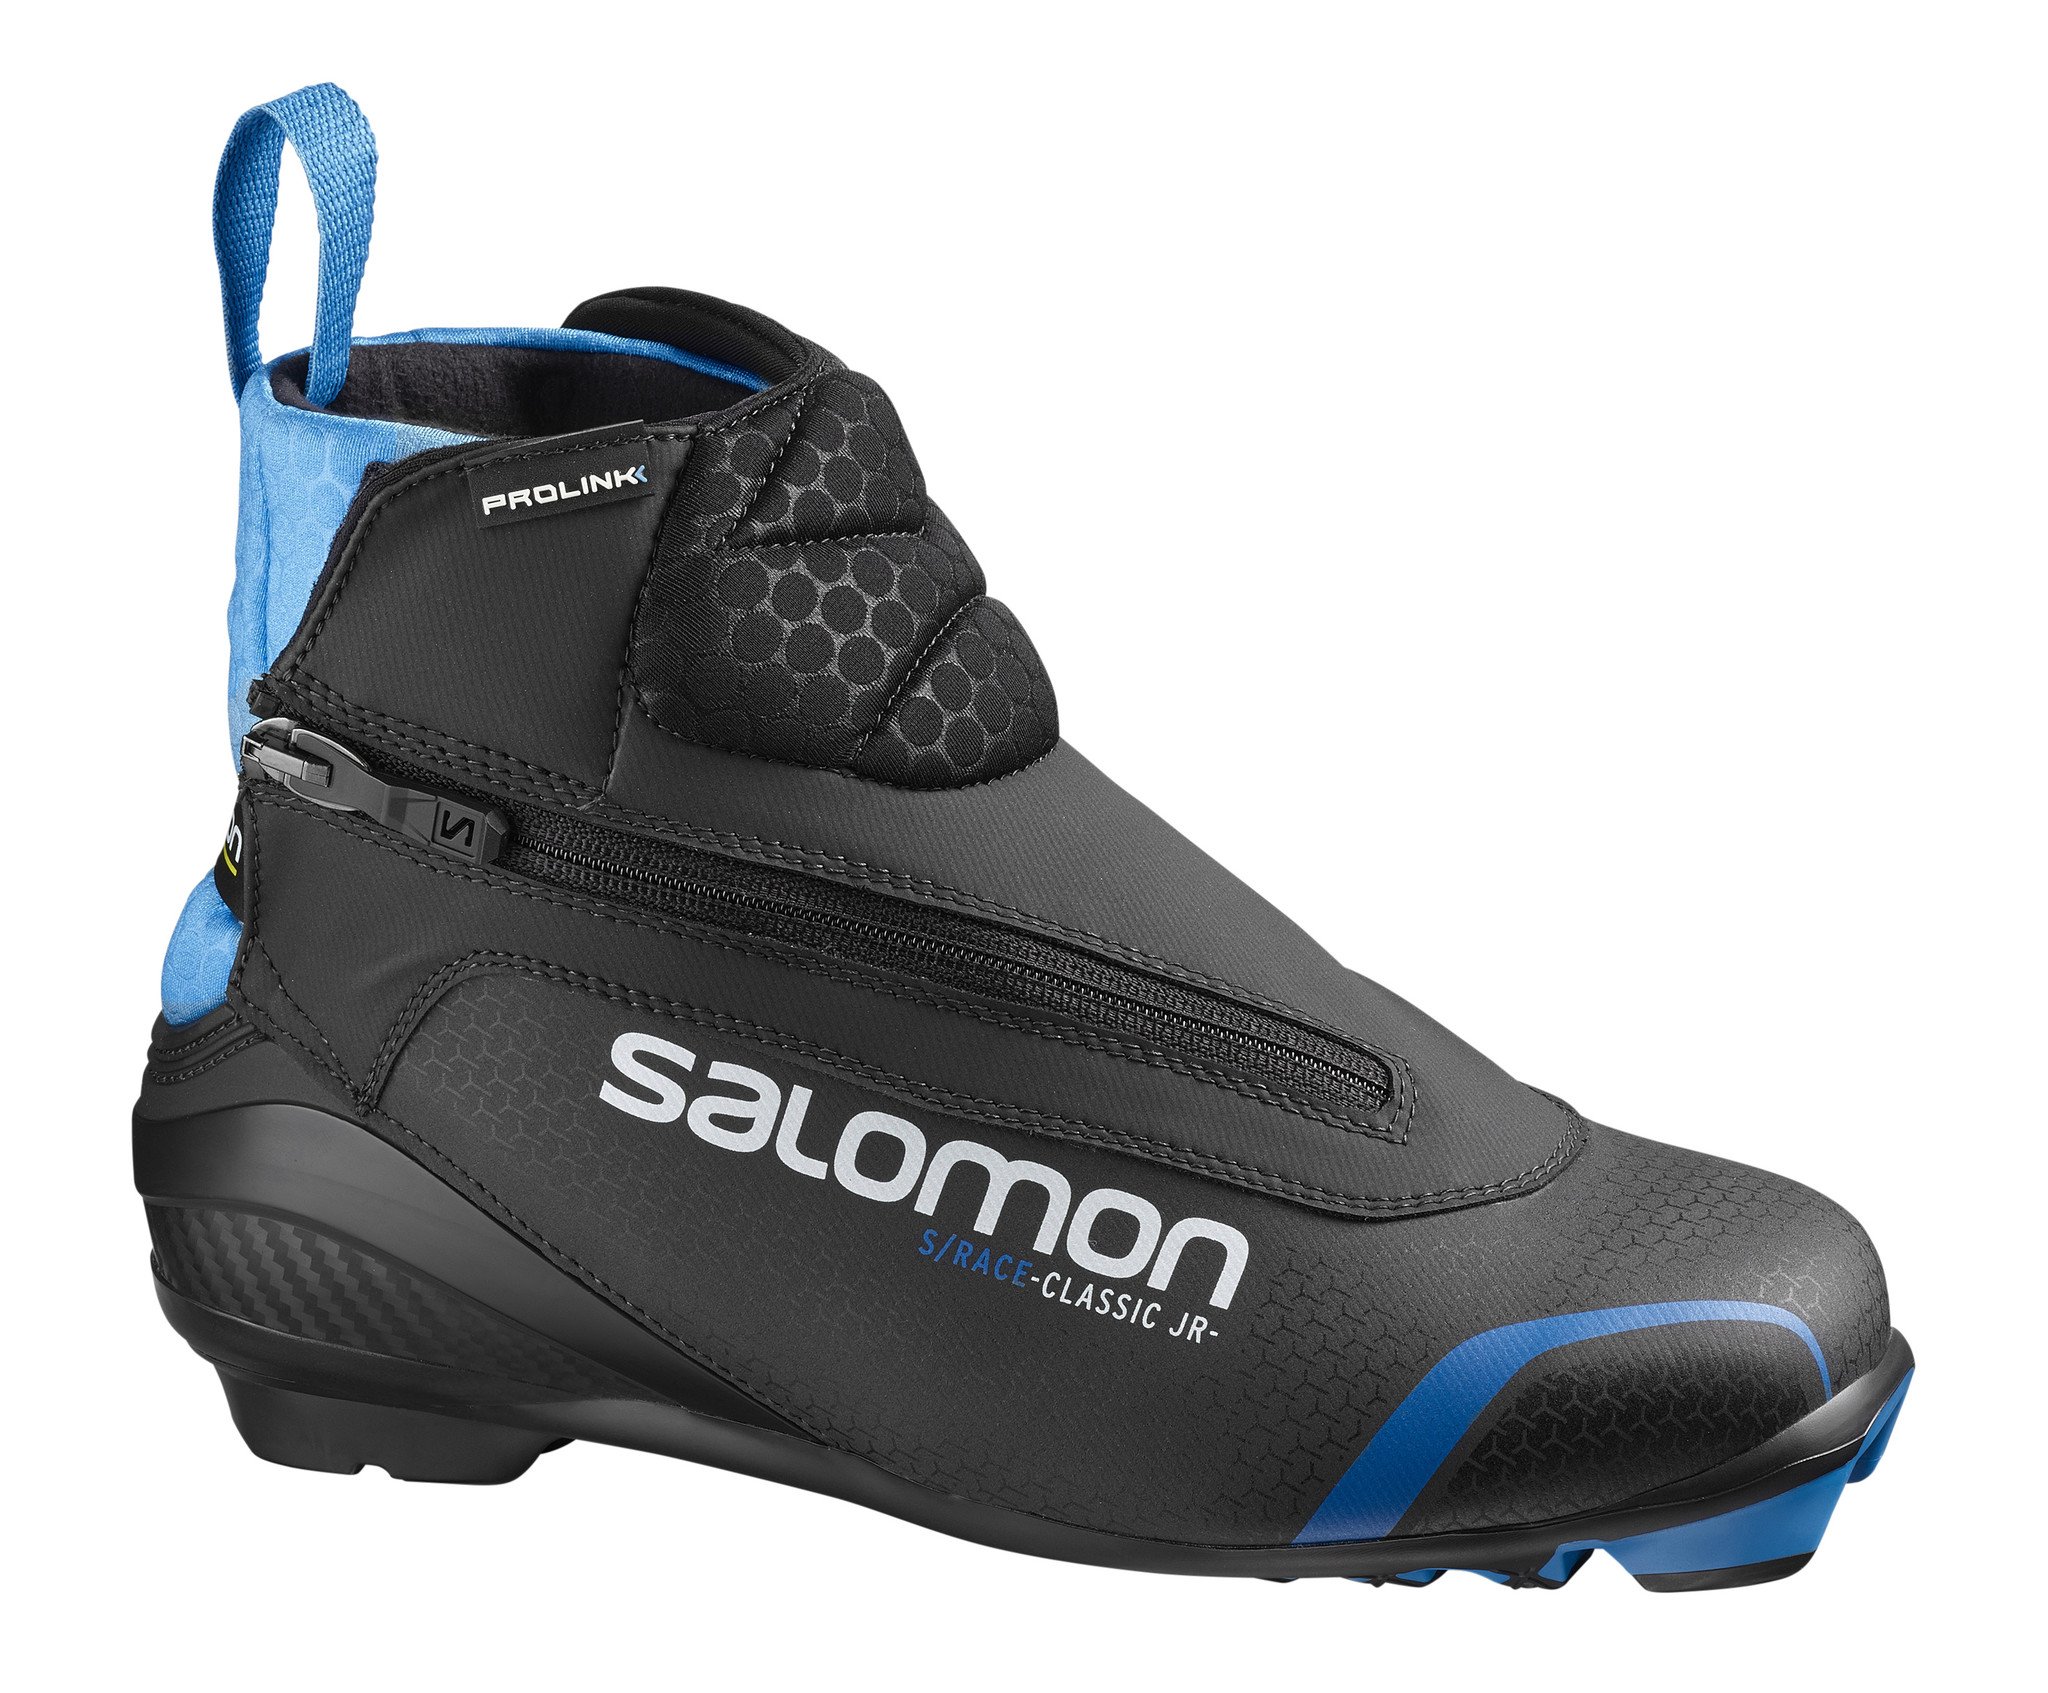 Salomon S/Race Classic Prolink Jr